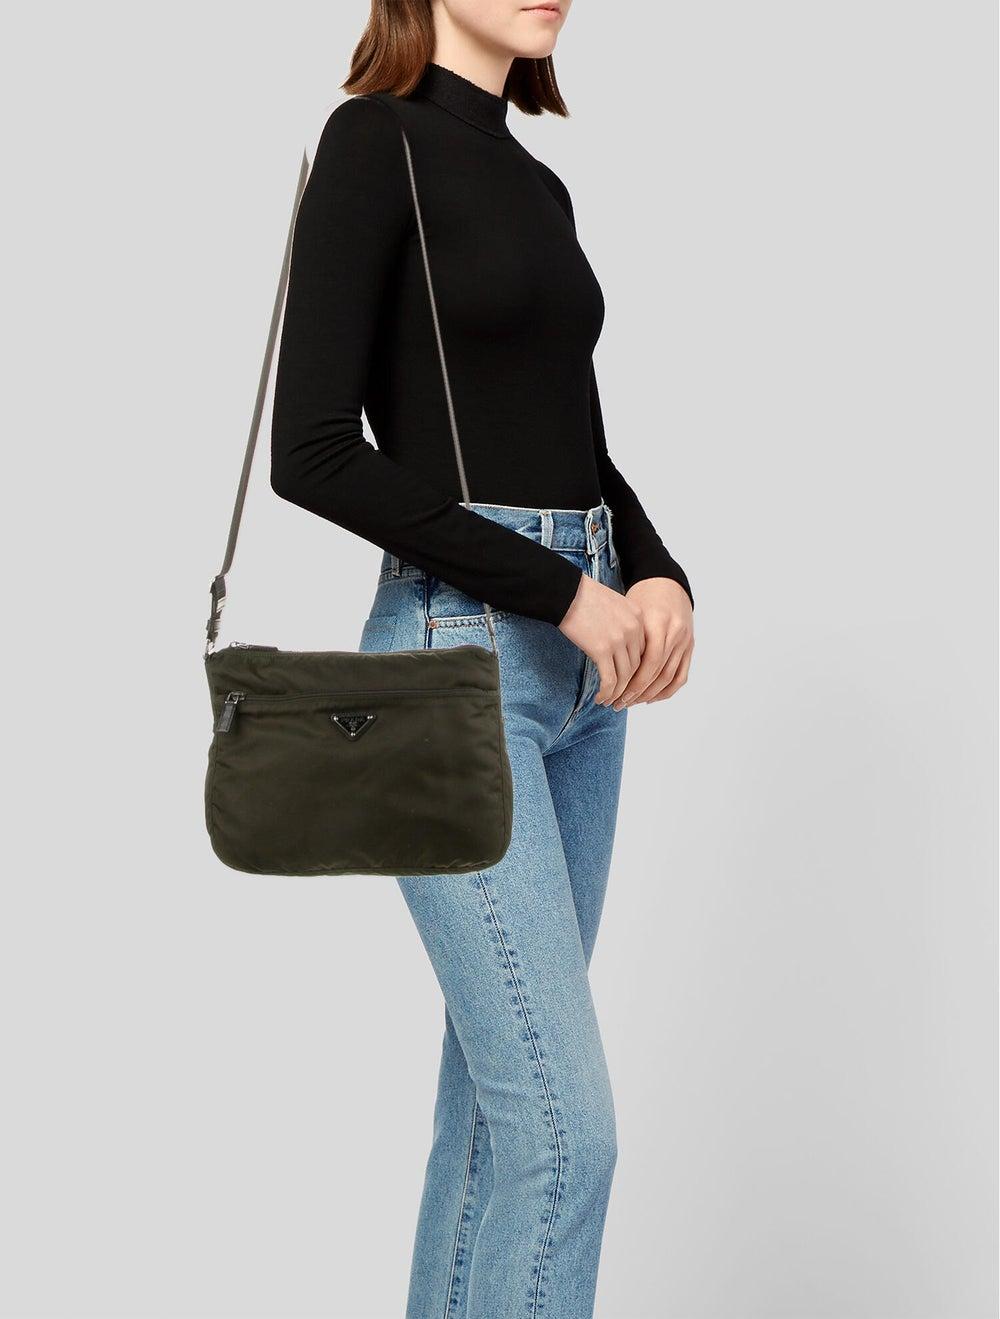 Prada Tessuto Messenger Bag Green - image 2